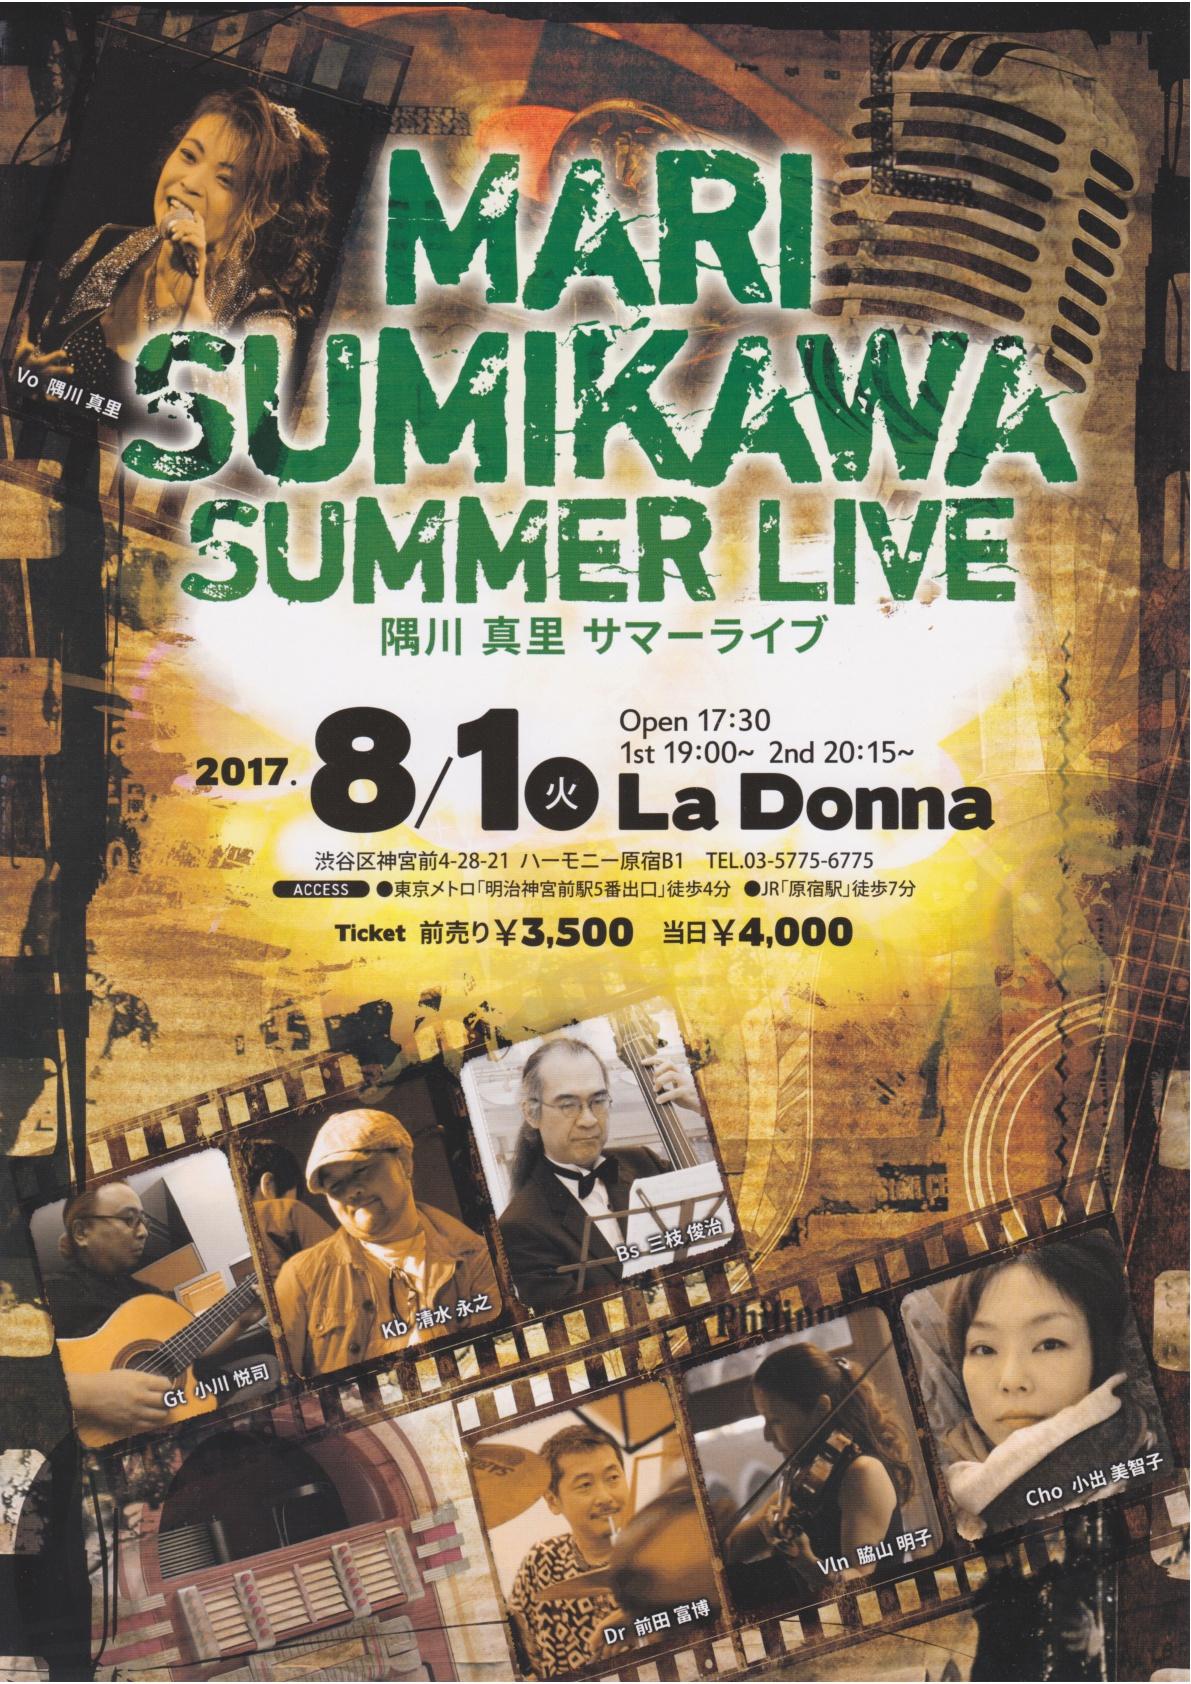 MARI SUMIKAWA SUMMER LIVE